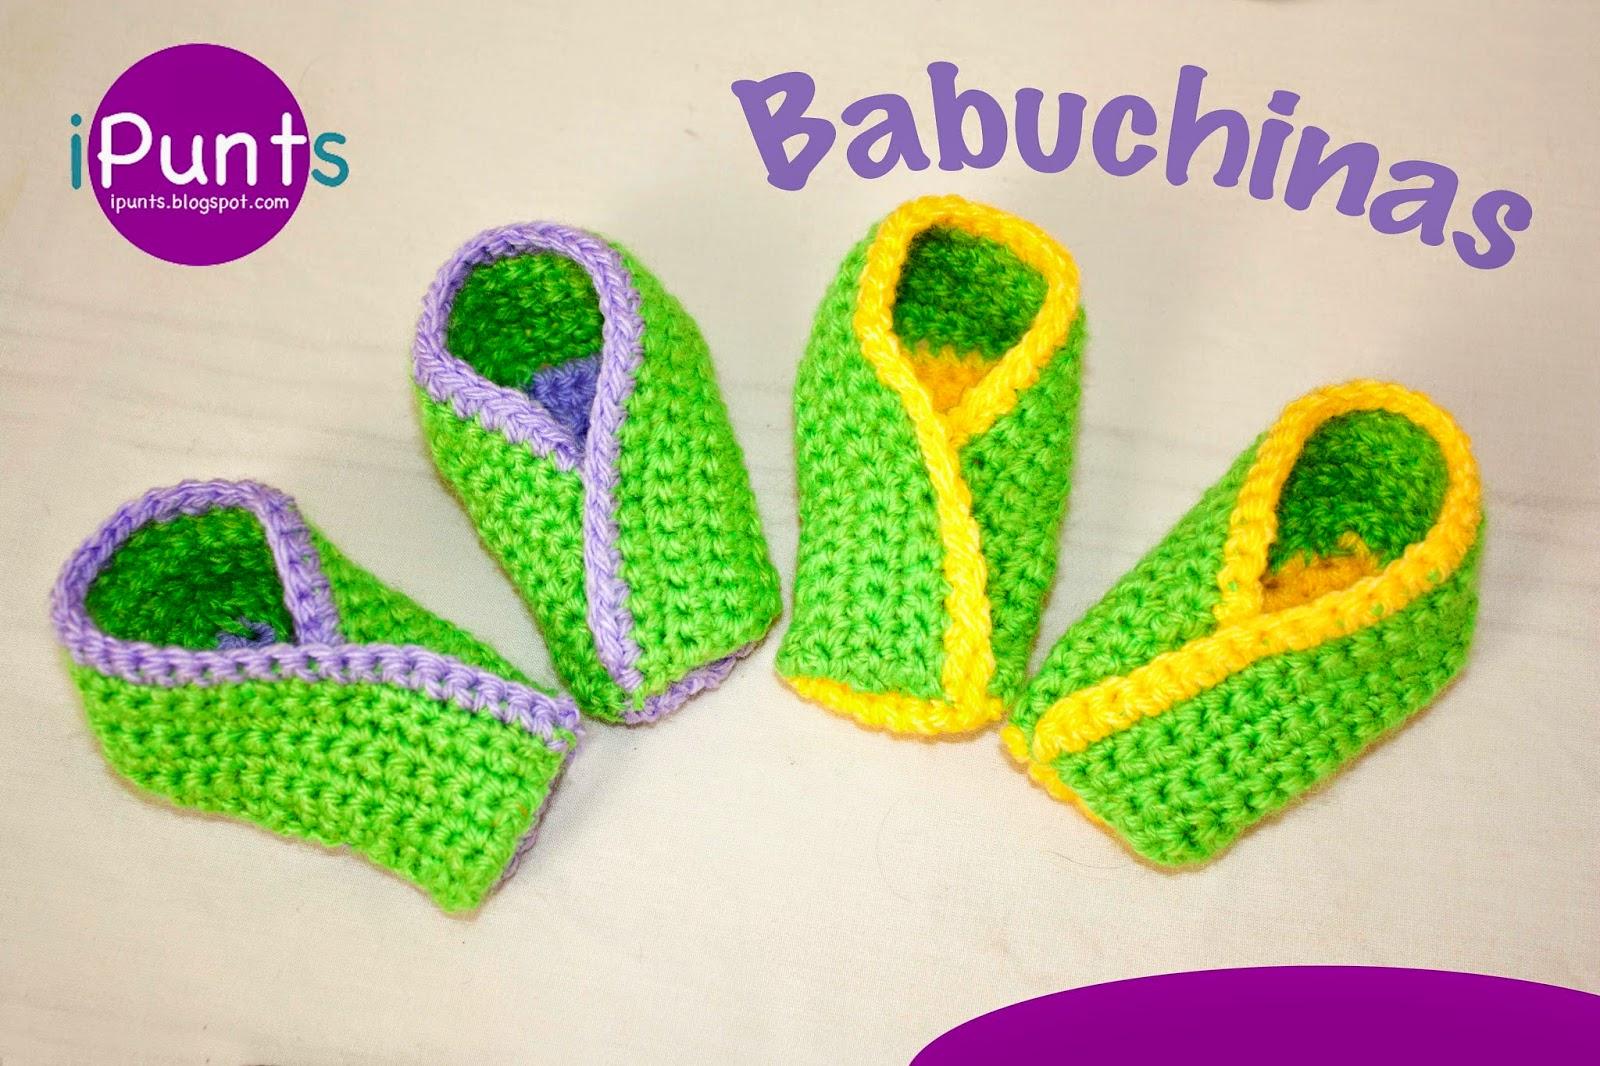 babuchinas zapatillas crochet ganchillo patron